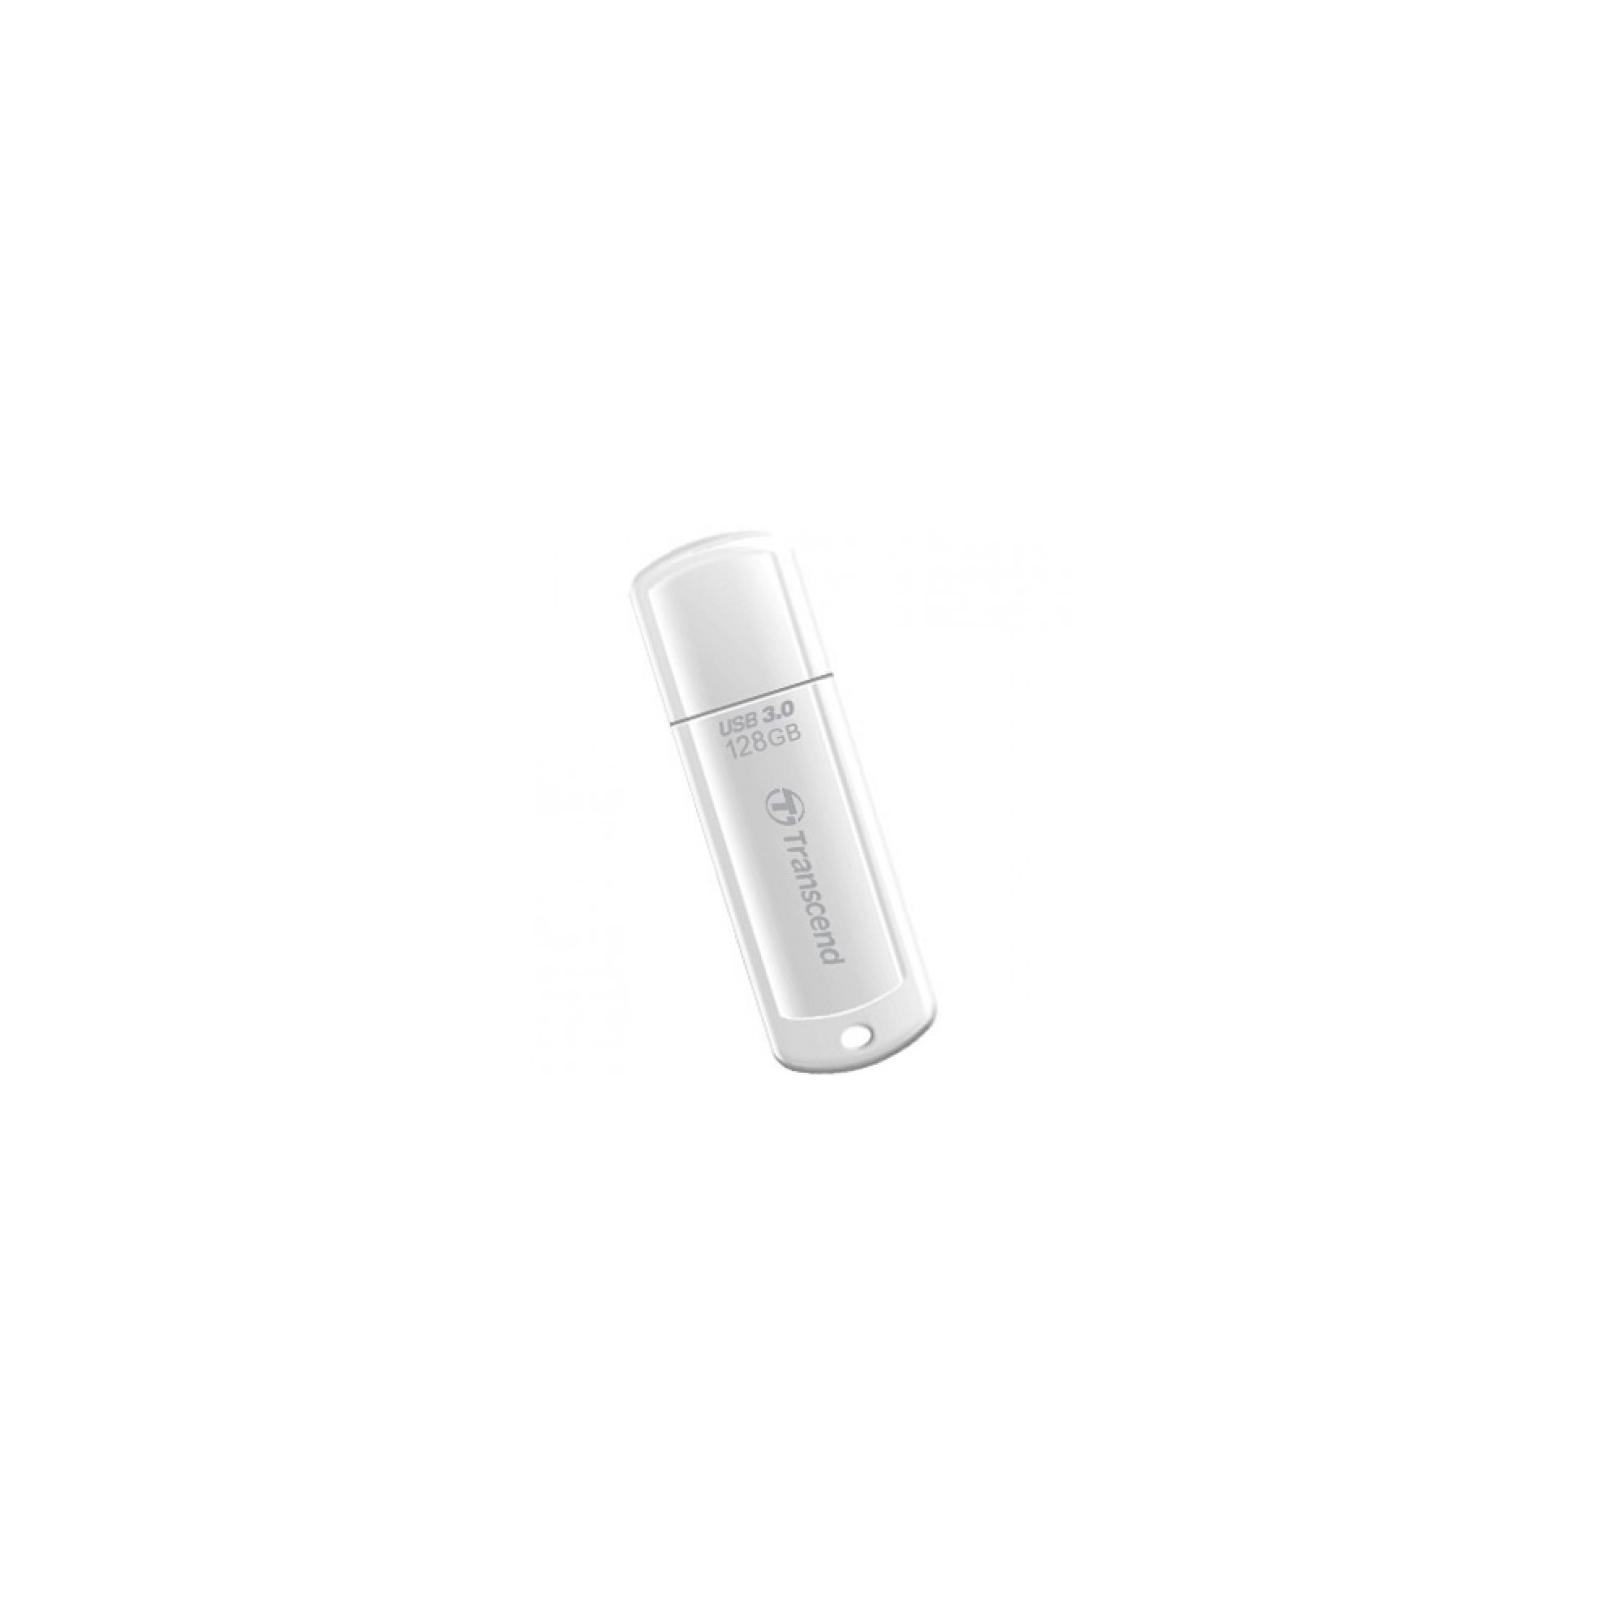 USB флеш накопитель Transcend 8Gb JetFlash 730 (TS8GJF730) изображение 3